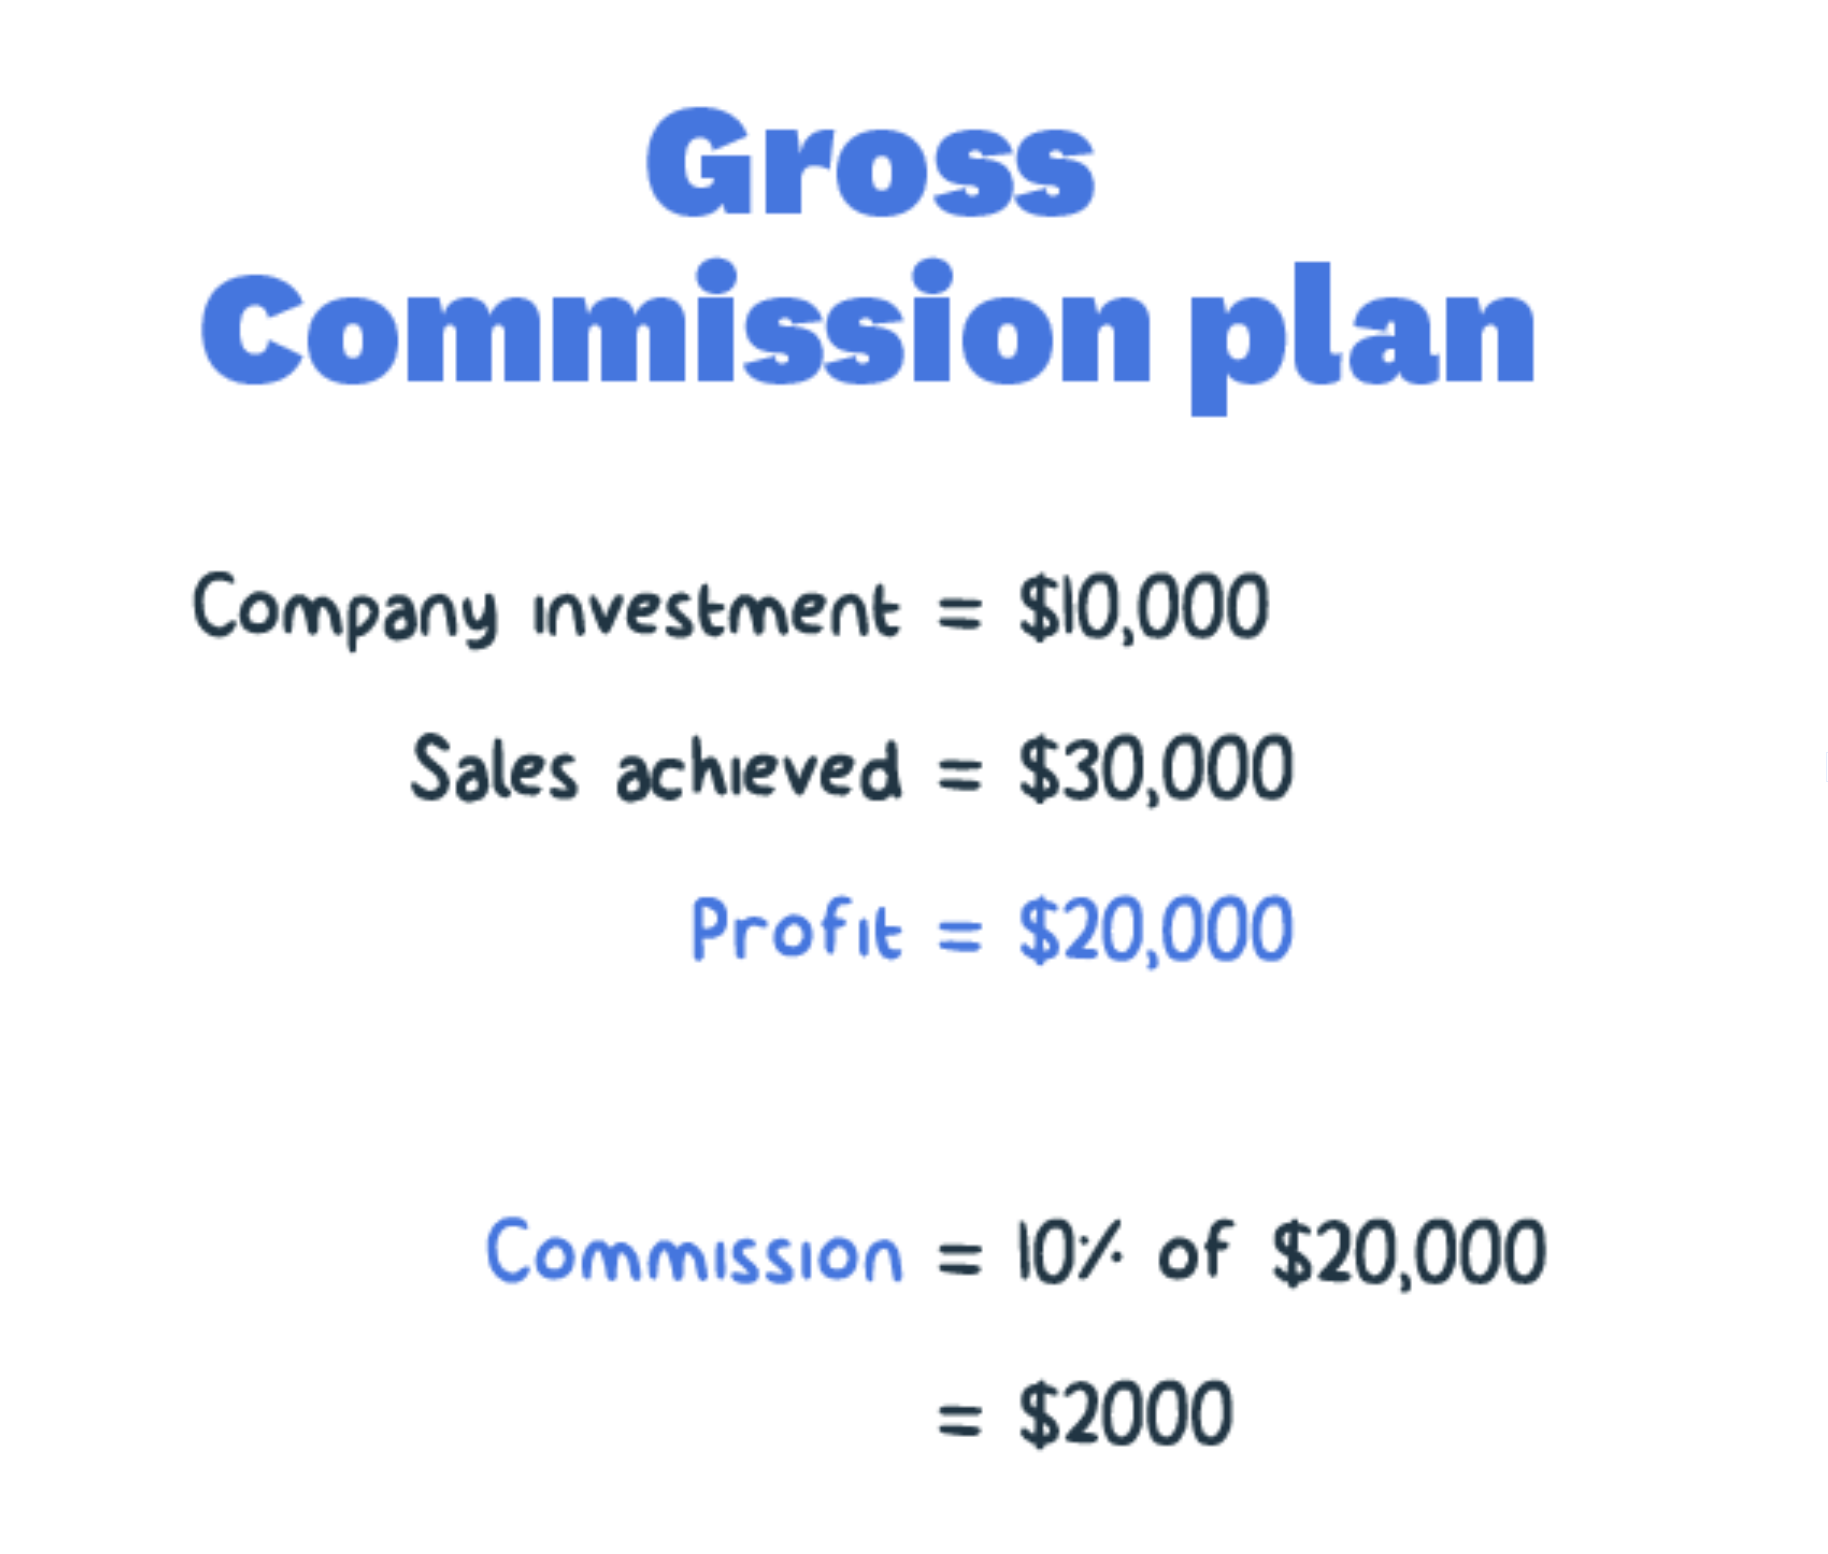 Gross Commission Plan